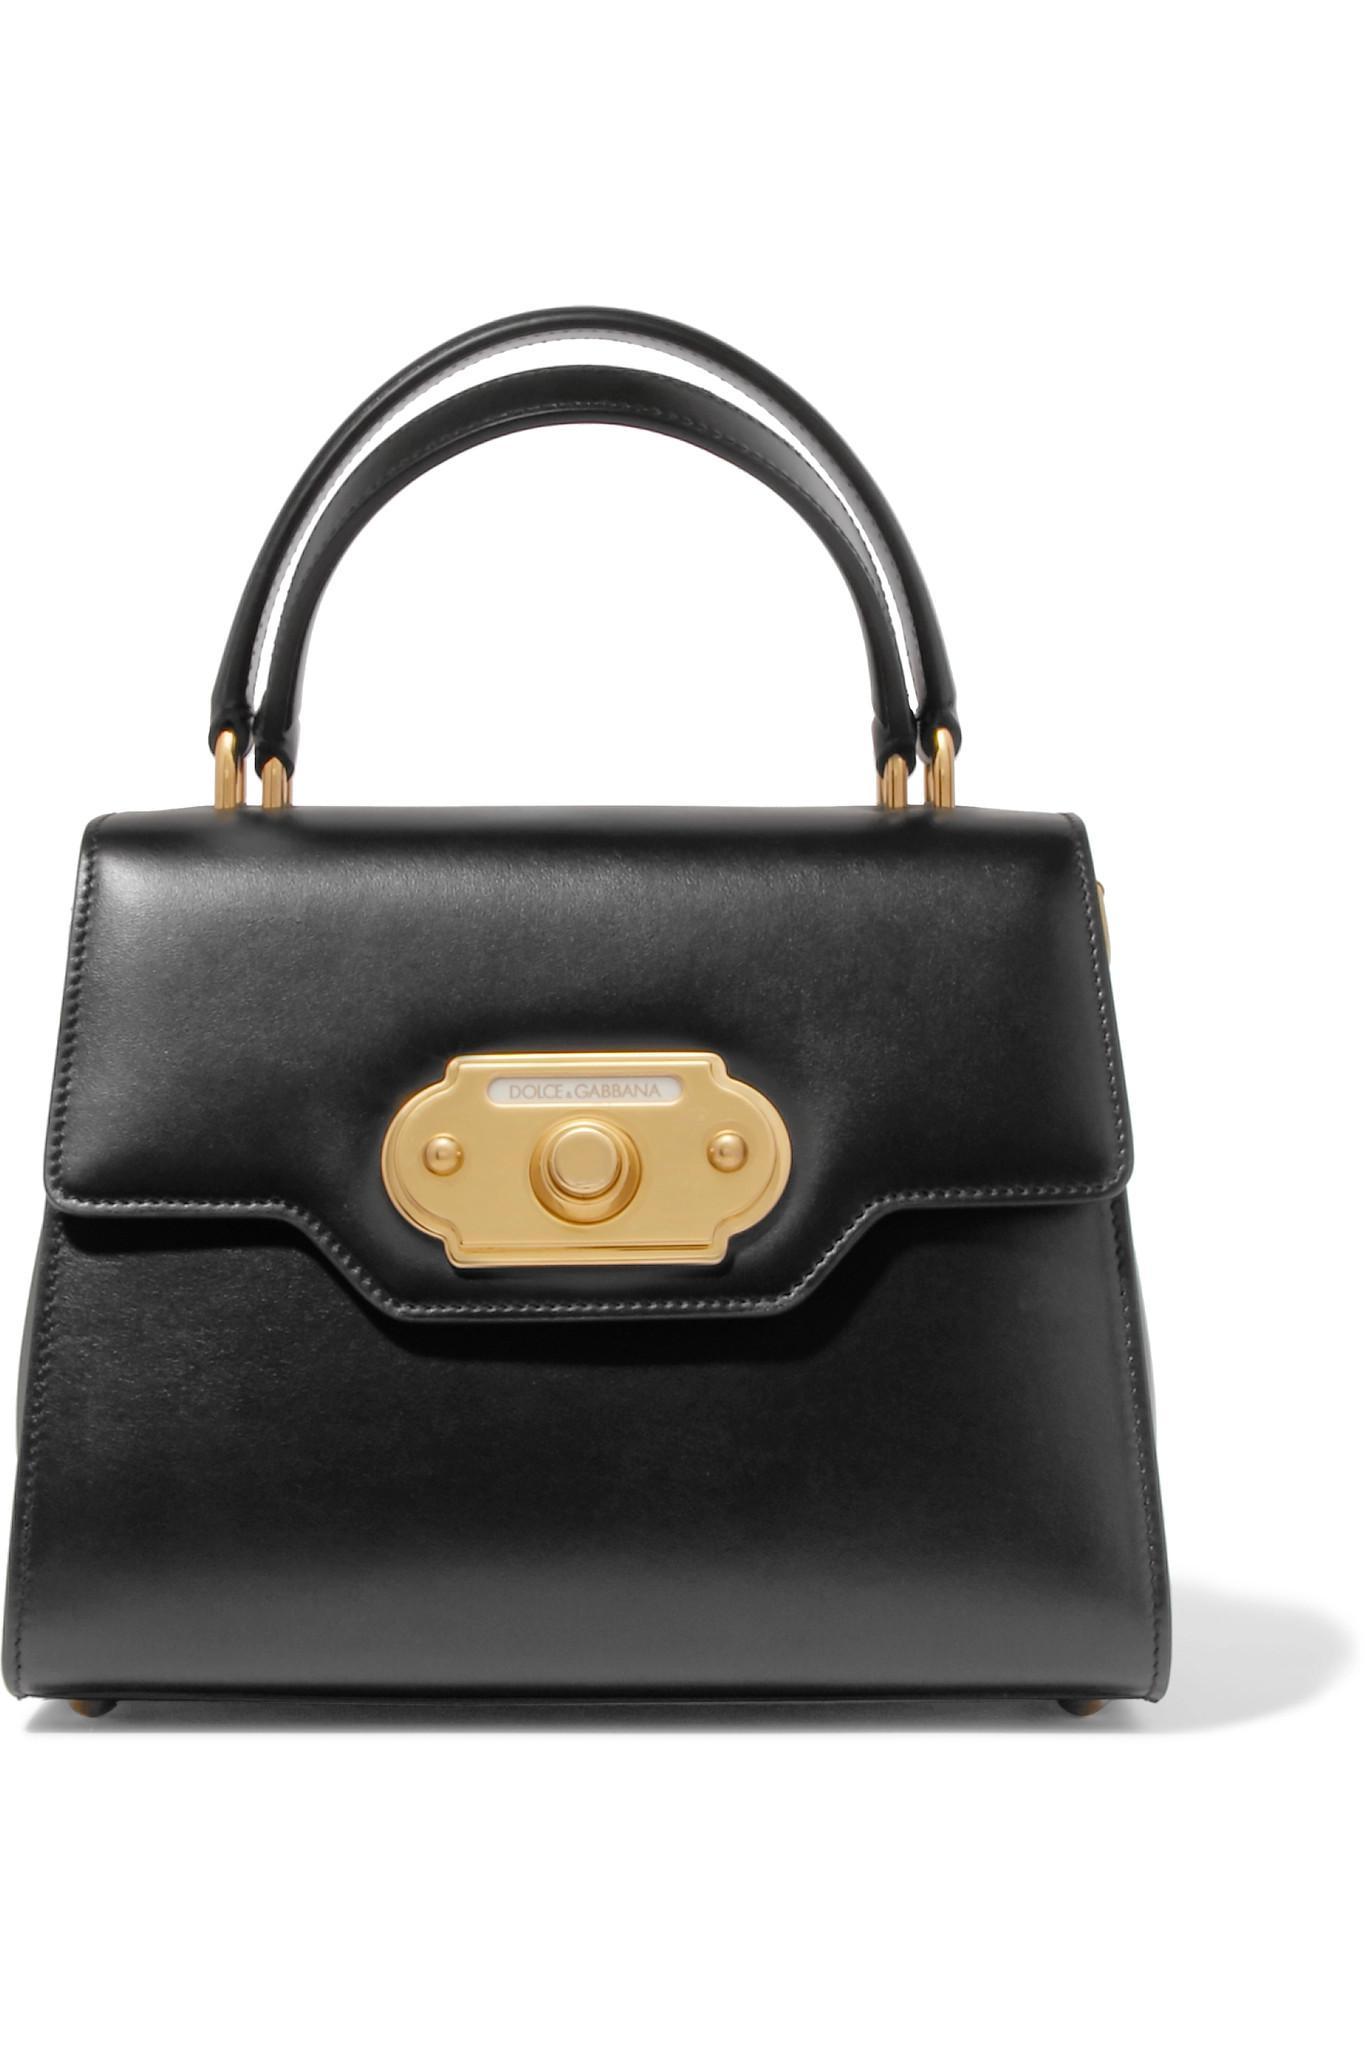 black Welcome medium leather tote Dolce & Gabbana lw8Lhv